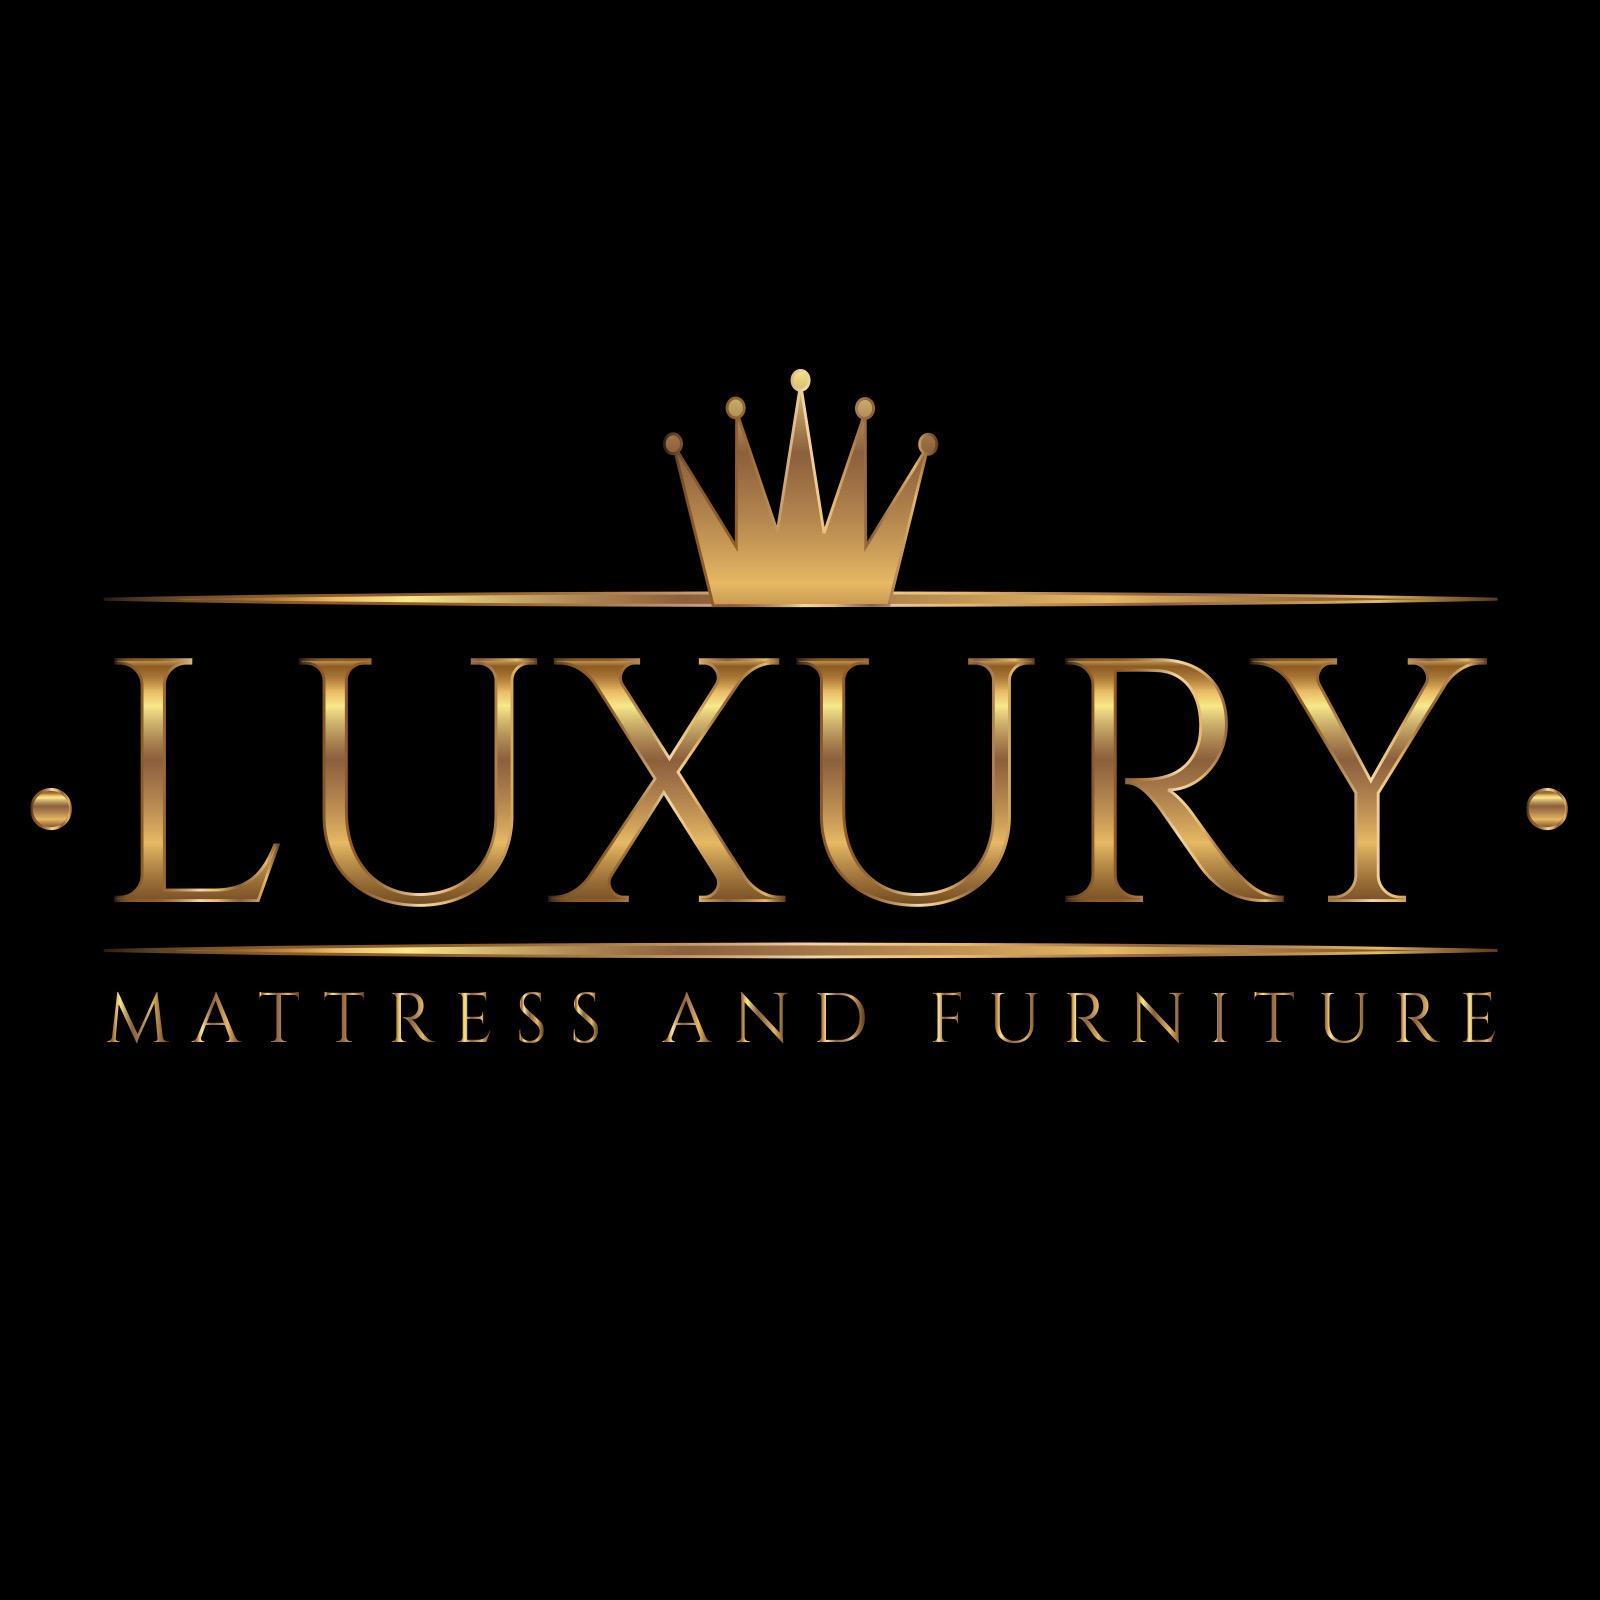 Luxury Mattress and Furniture